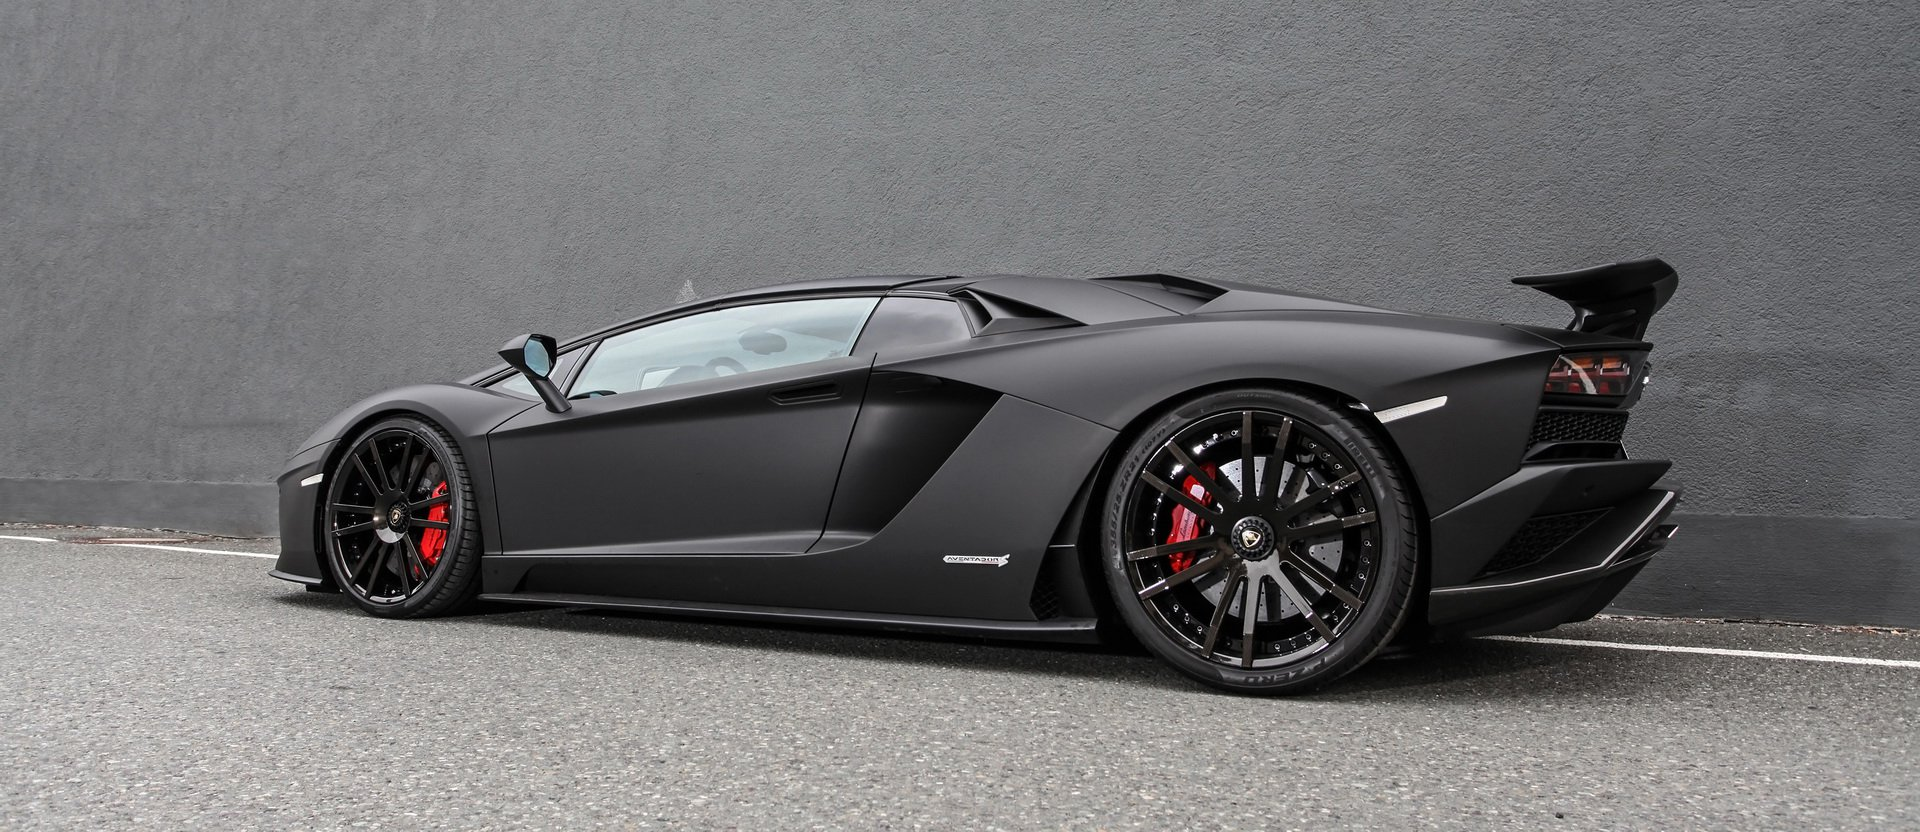 Lamborghini Aventador S Roadster by Wheelsandmore (23)